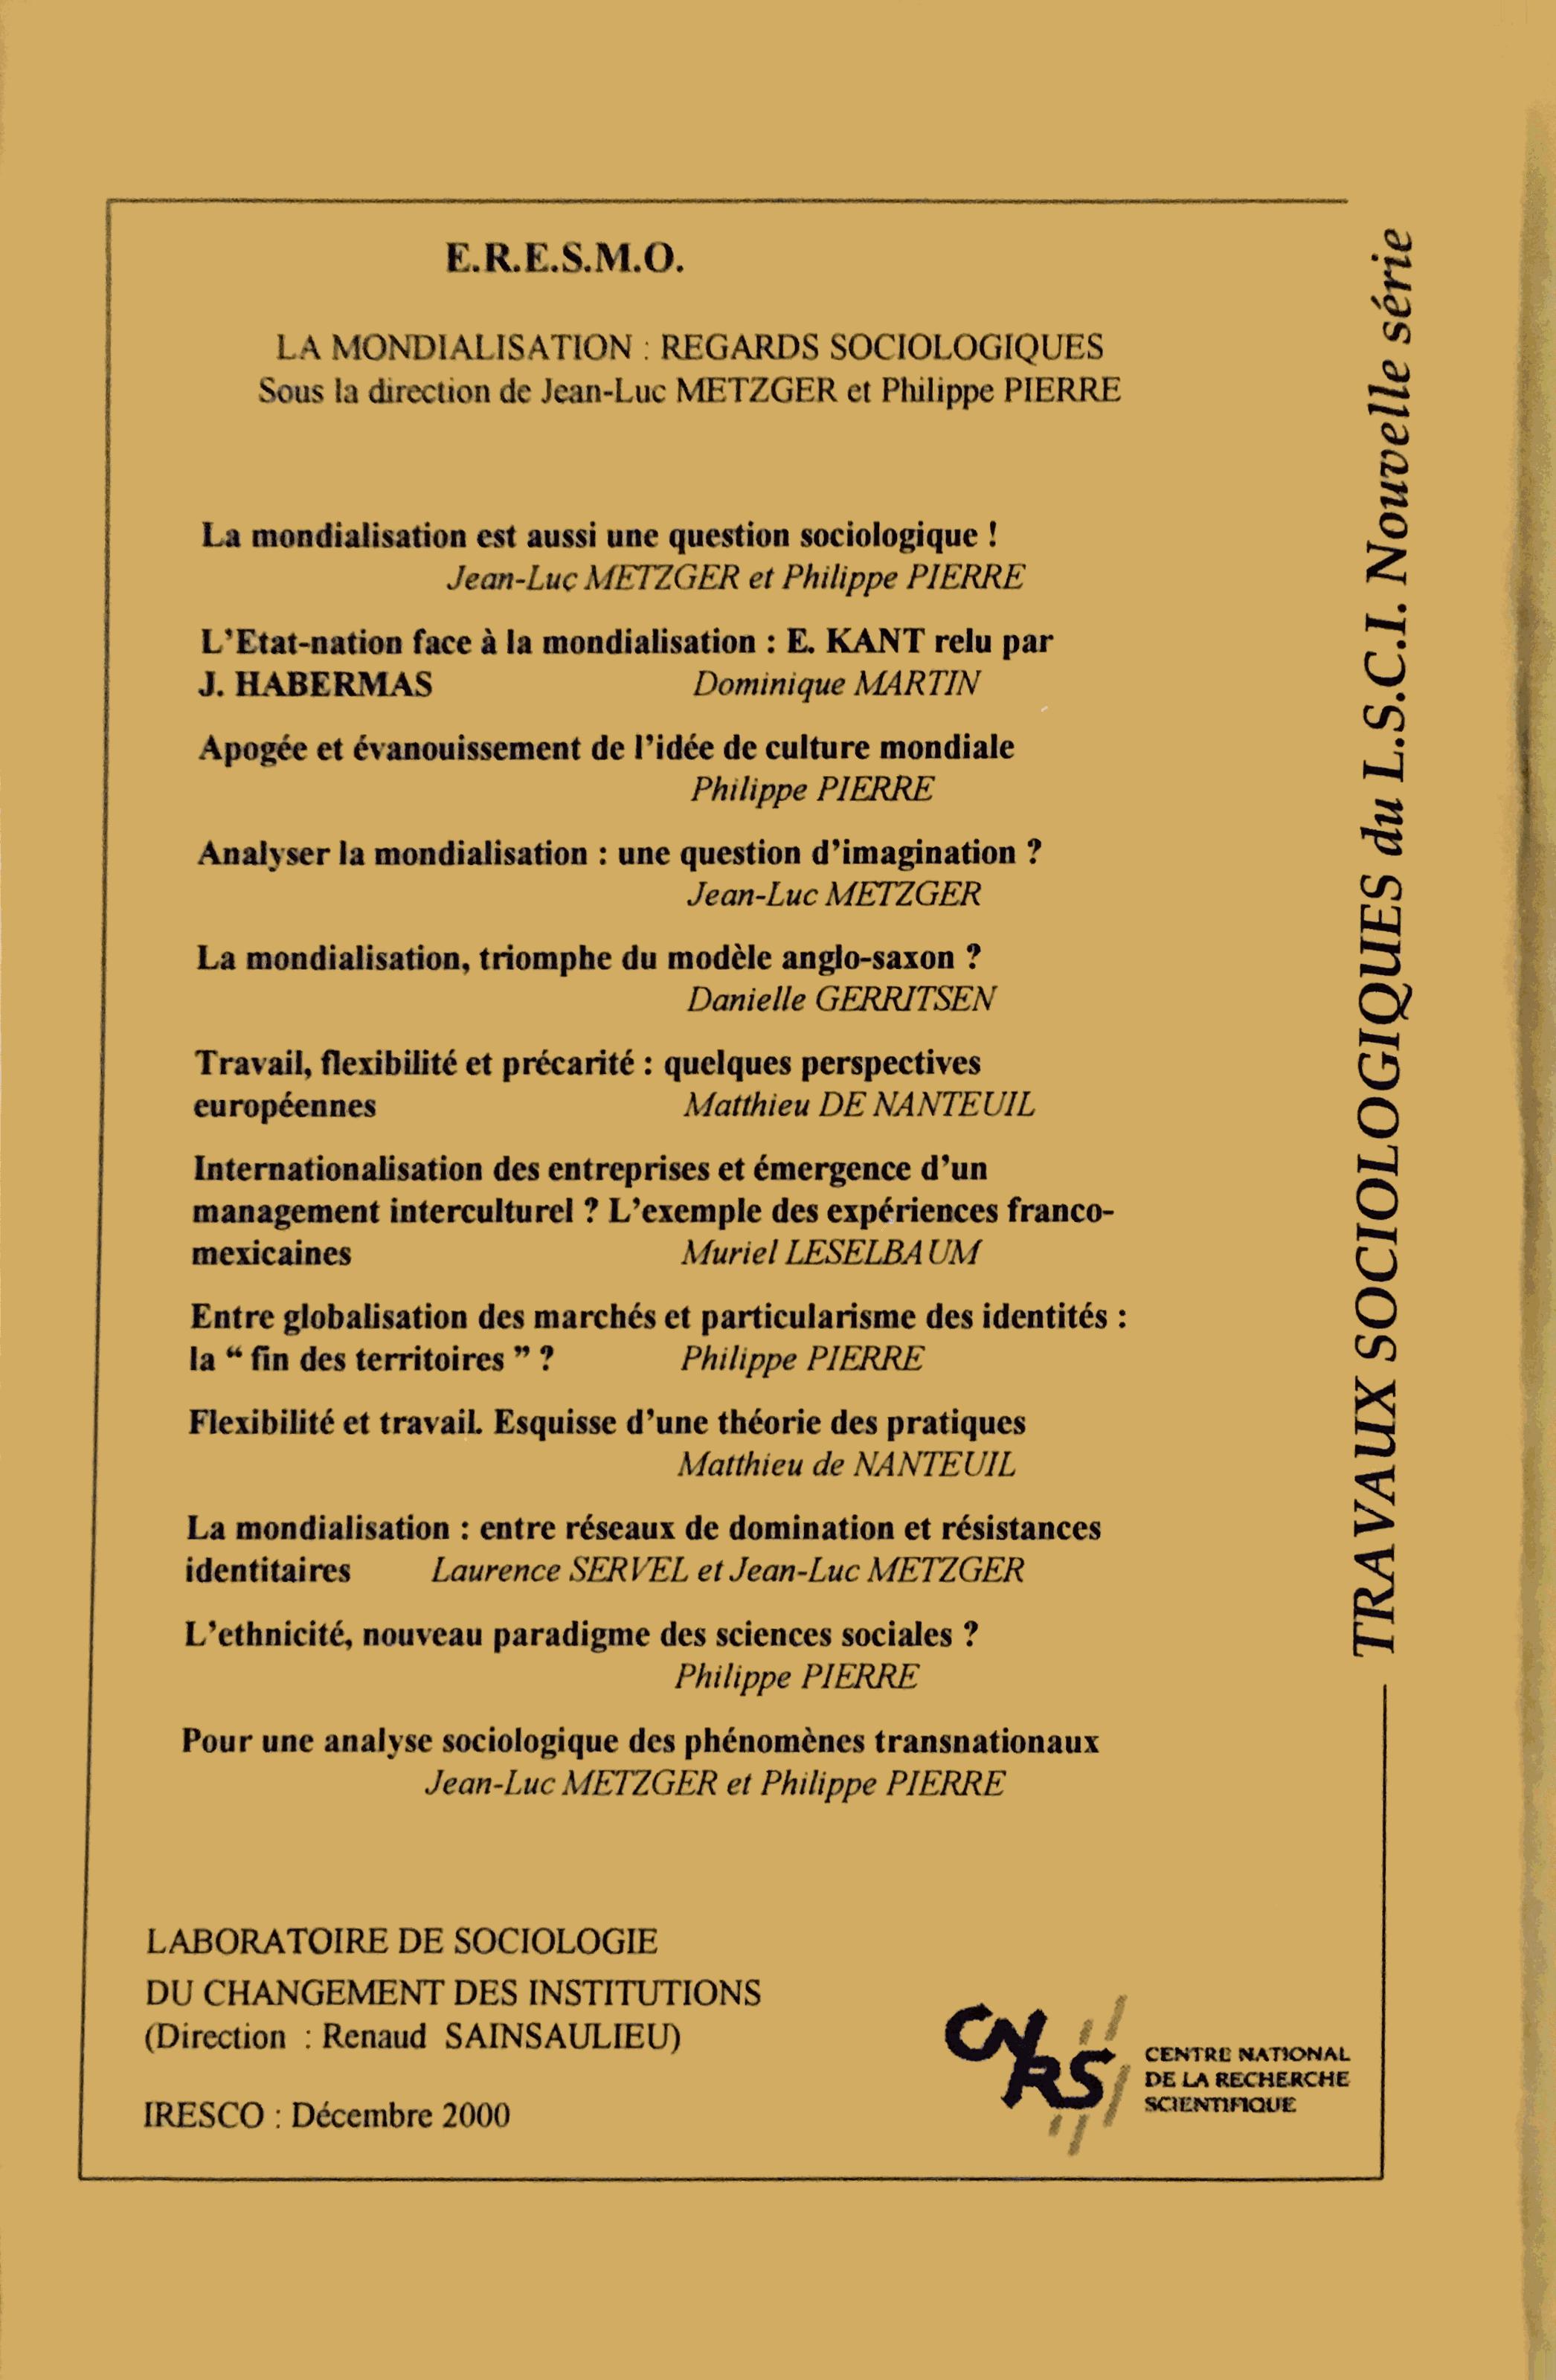 Description Mondialisation regards sociologiques